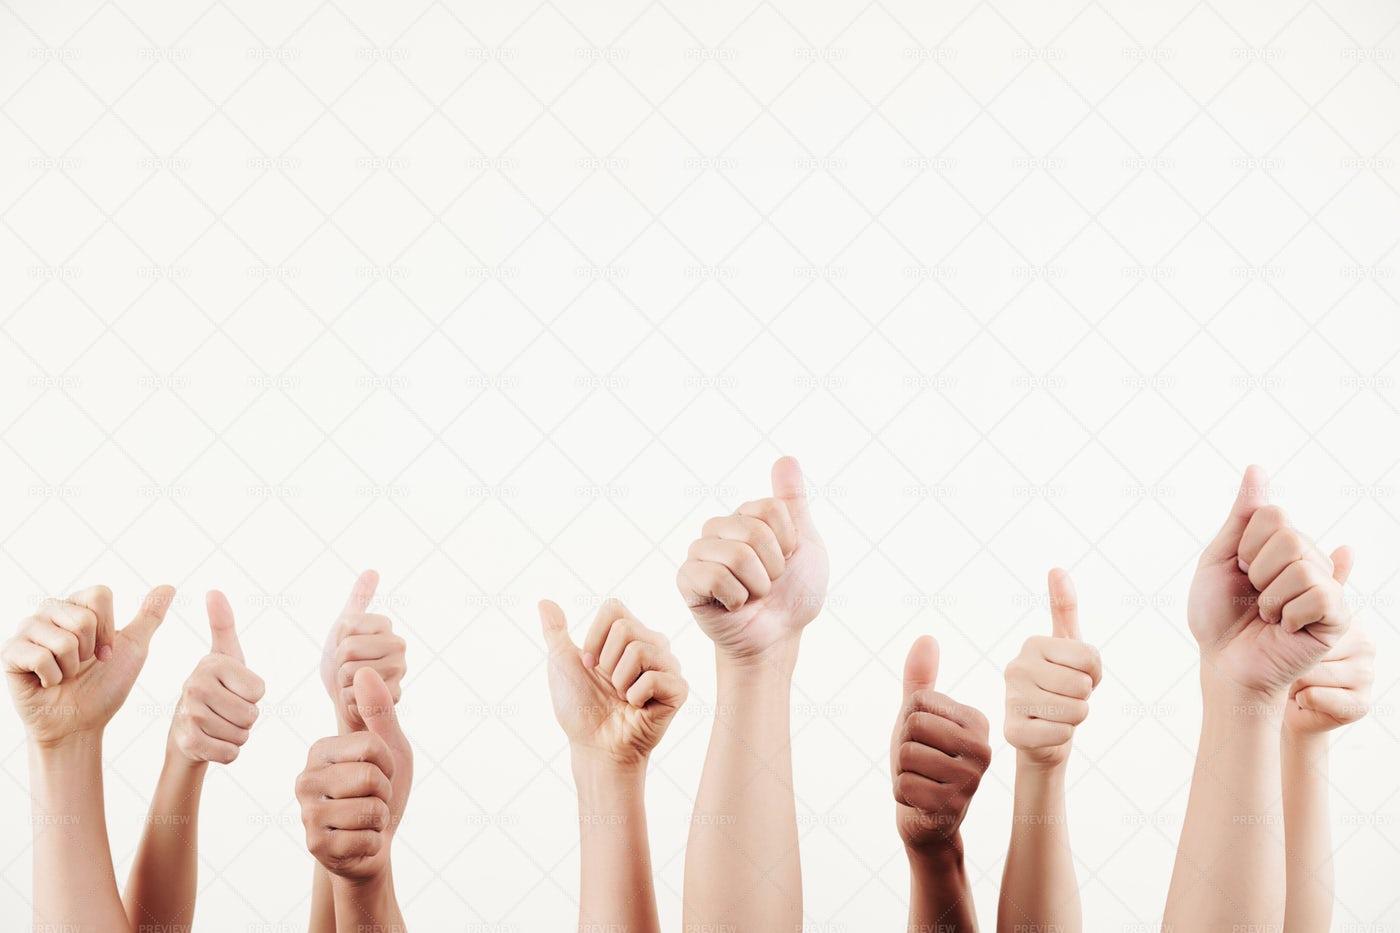 Successful People: Stock Photos